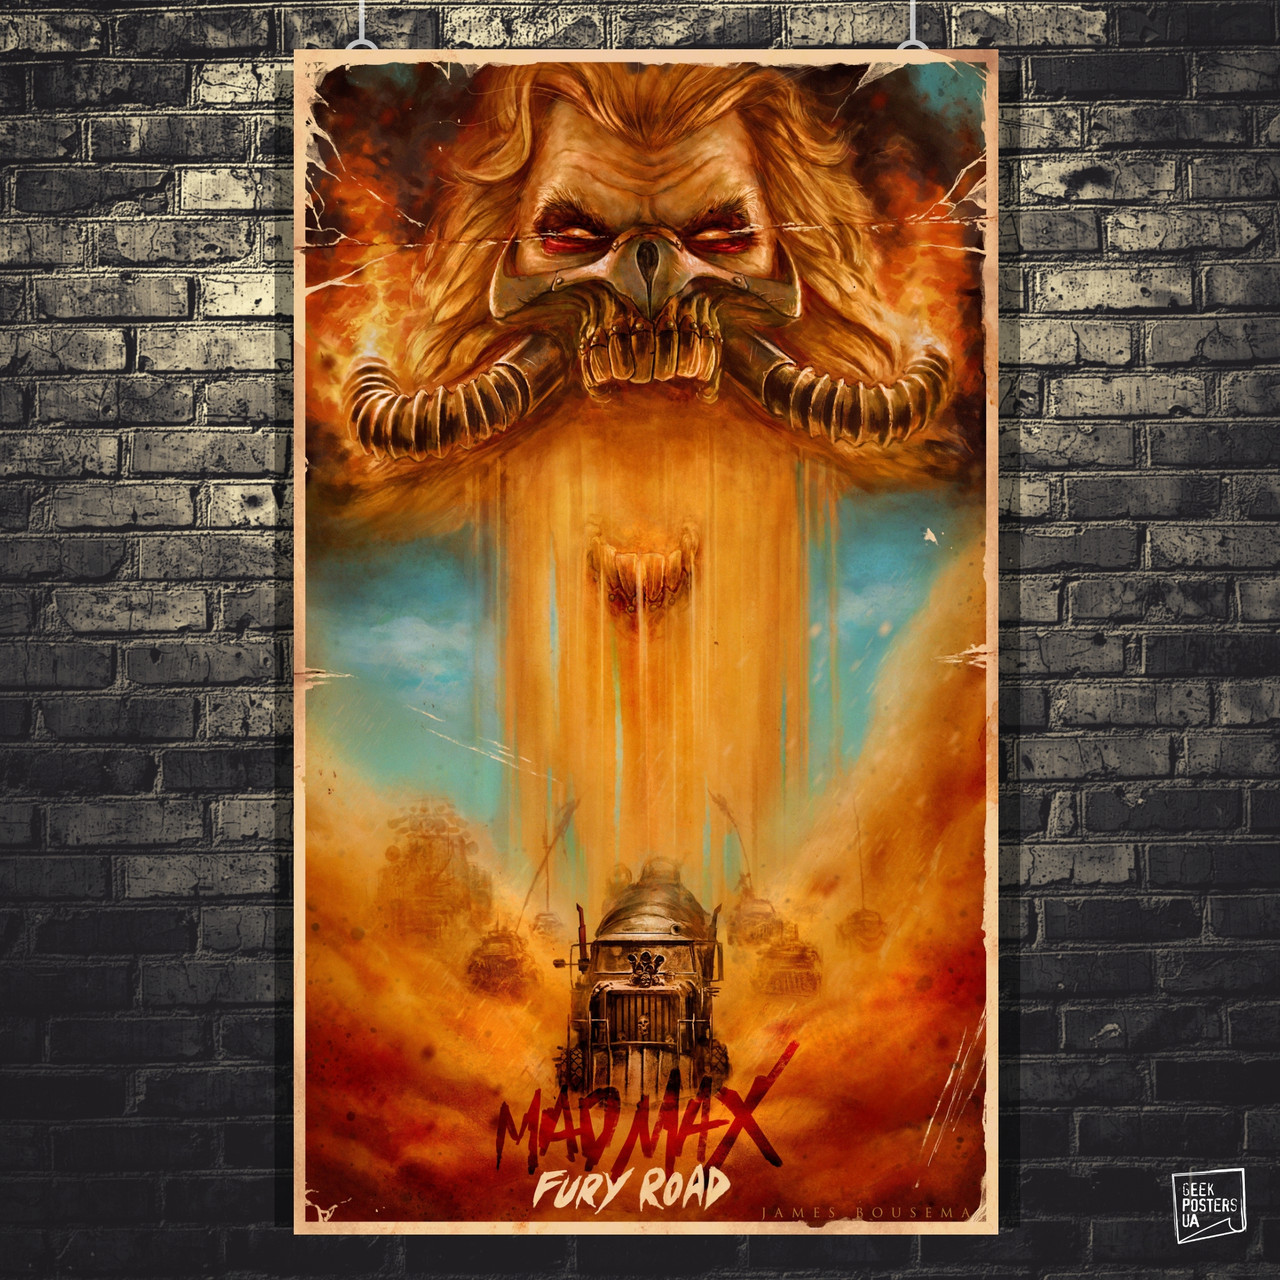 Постер Max Max: Fury Road, Безумный Макс: Дорога ярости. Размер 60x36см (A2). Глянцевая бумага